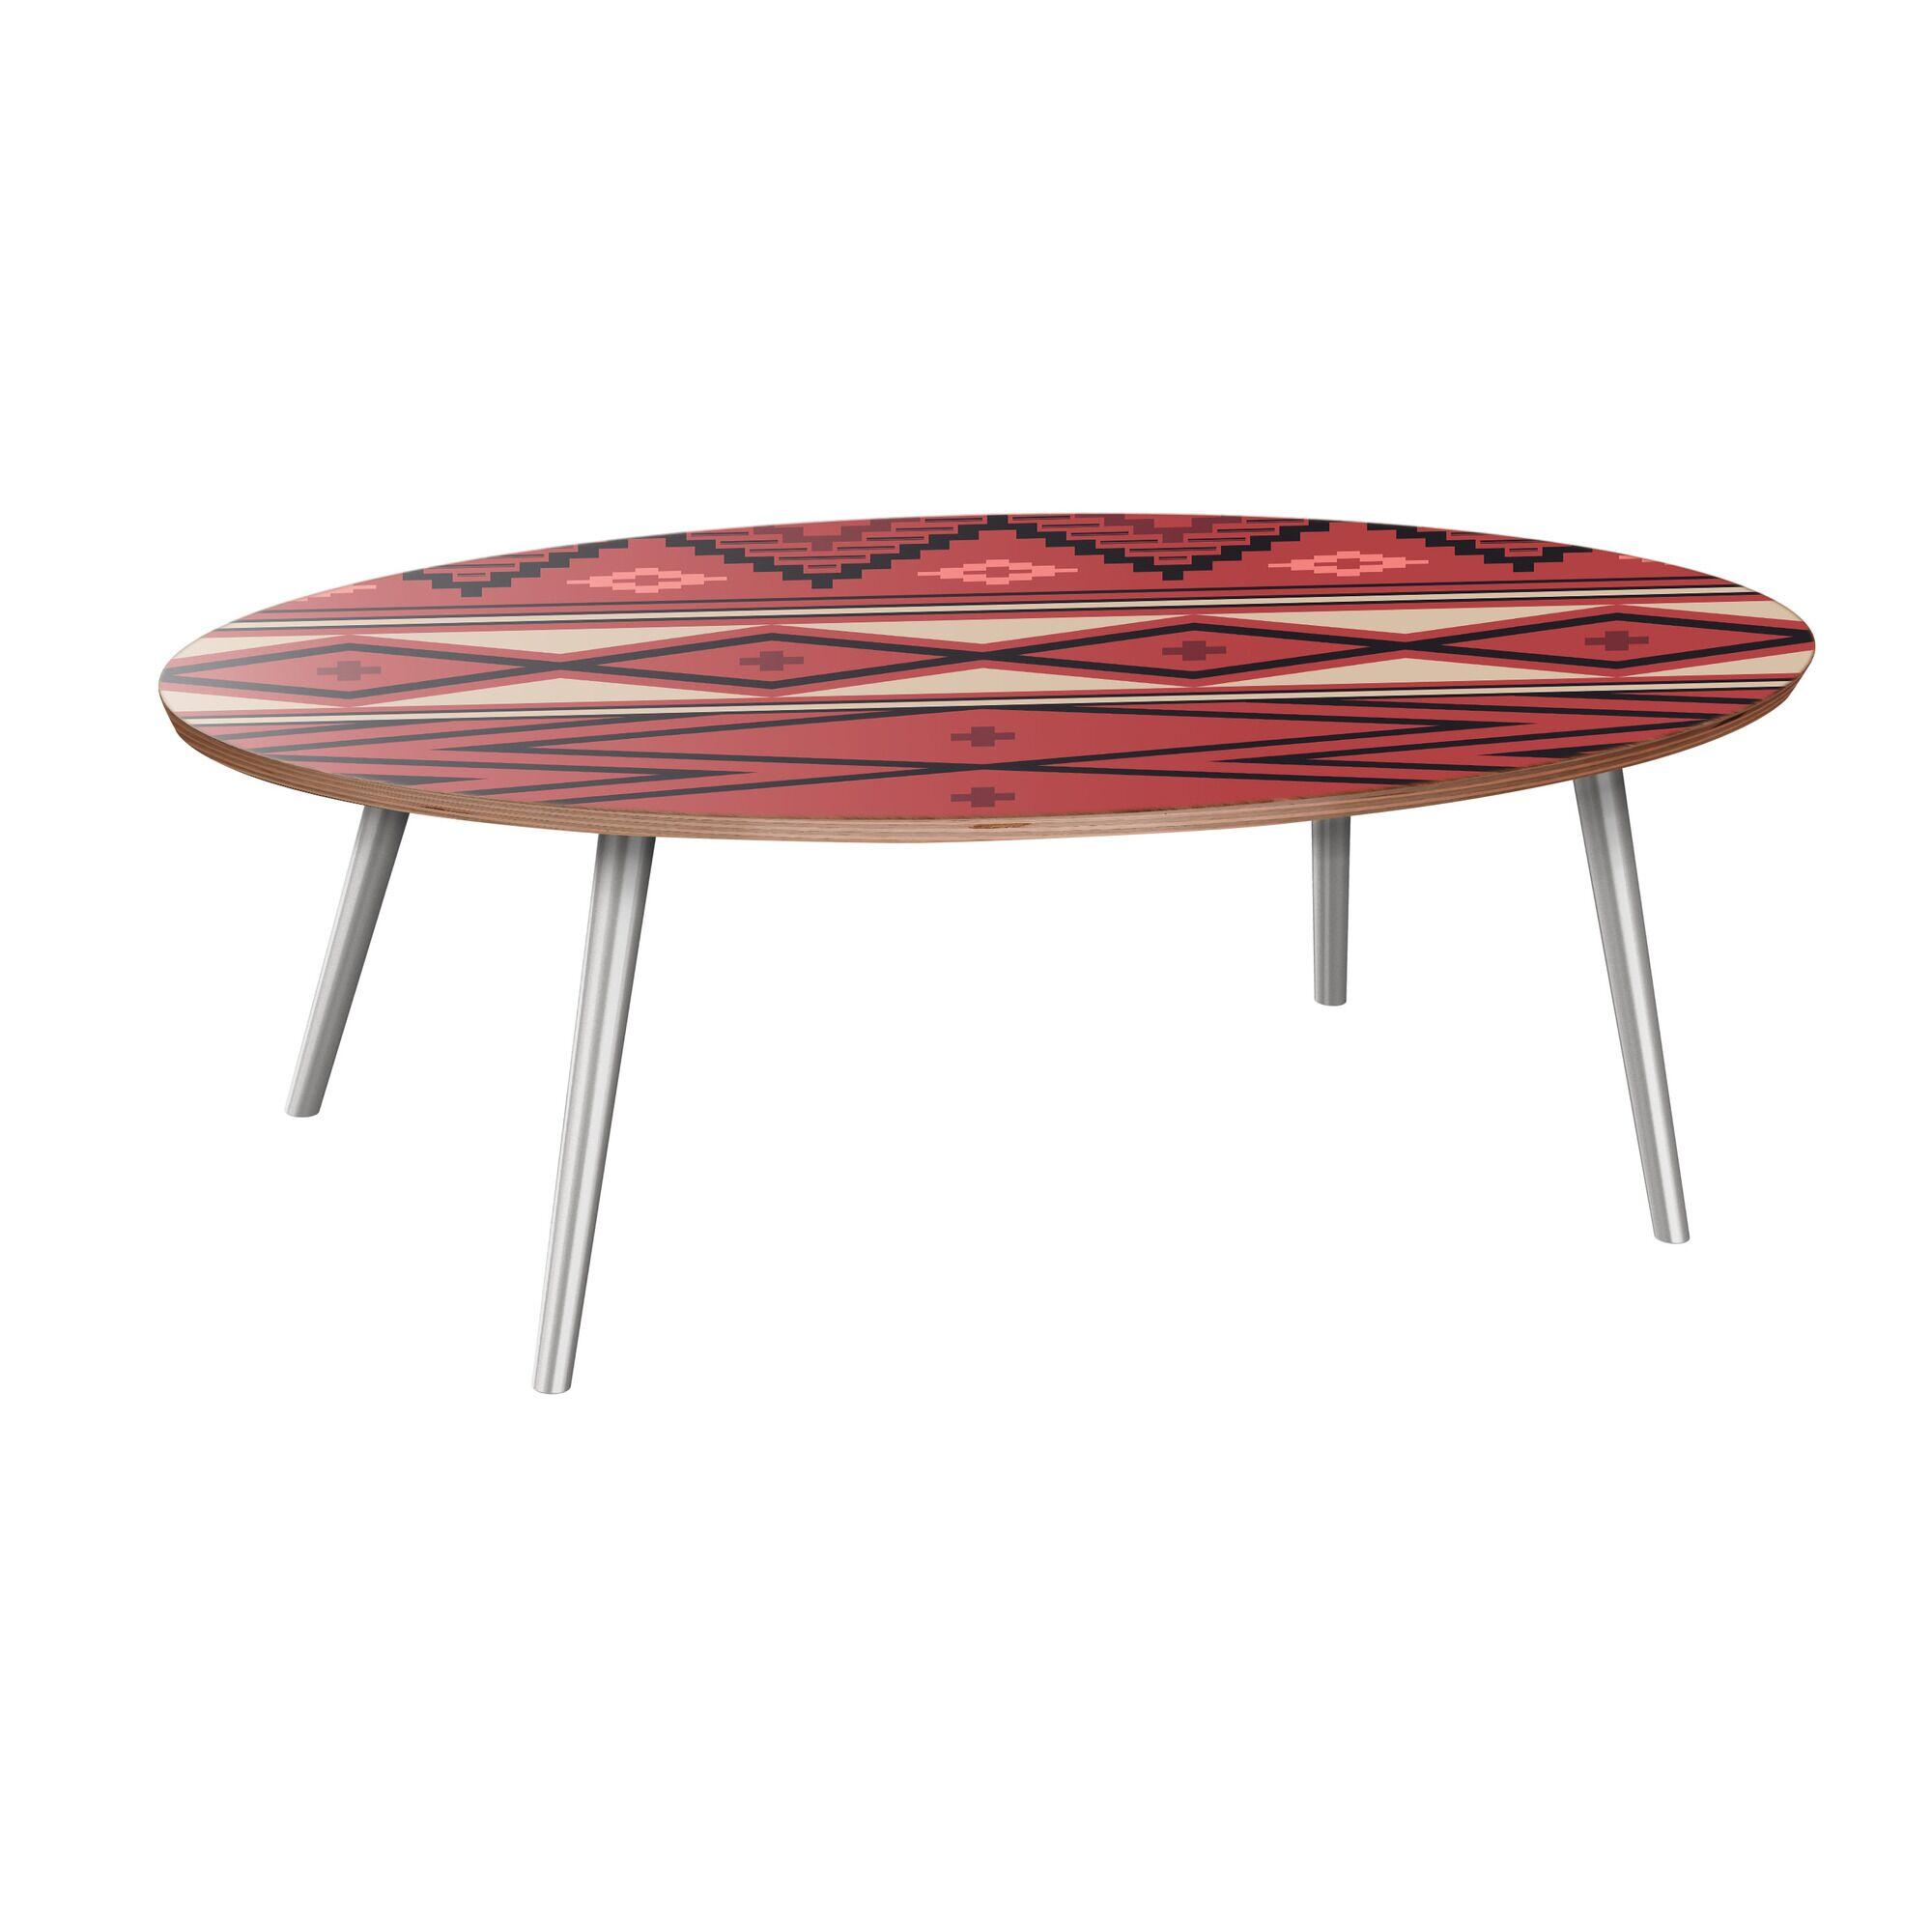 Huckins Coffee Table Table Base Color: Chrome, Table Top Boarder Color: Walnut, Table Top Color: Pink/Blue